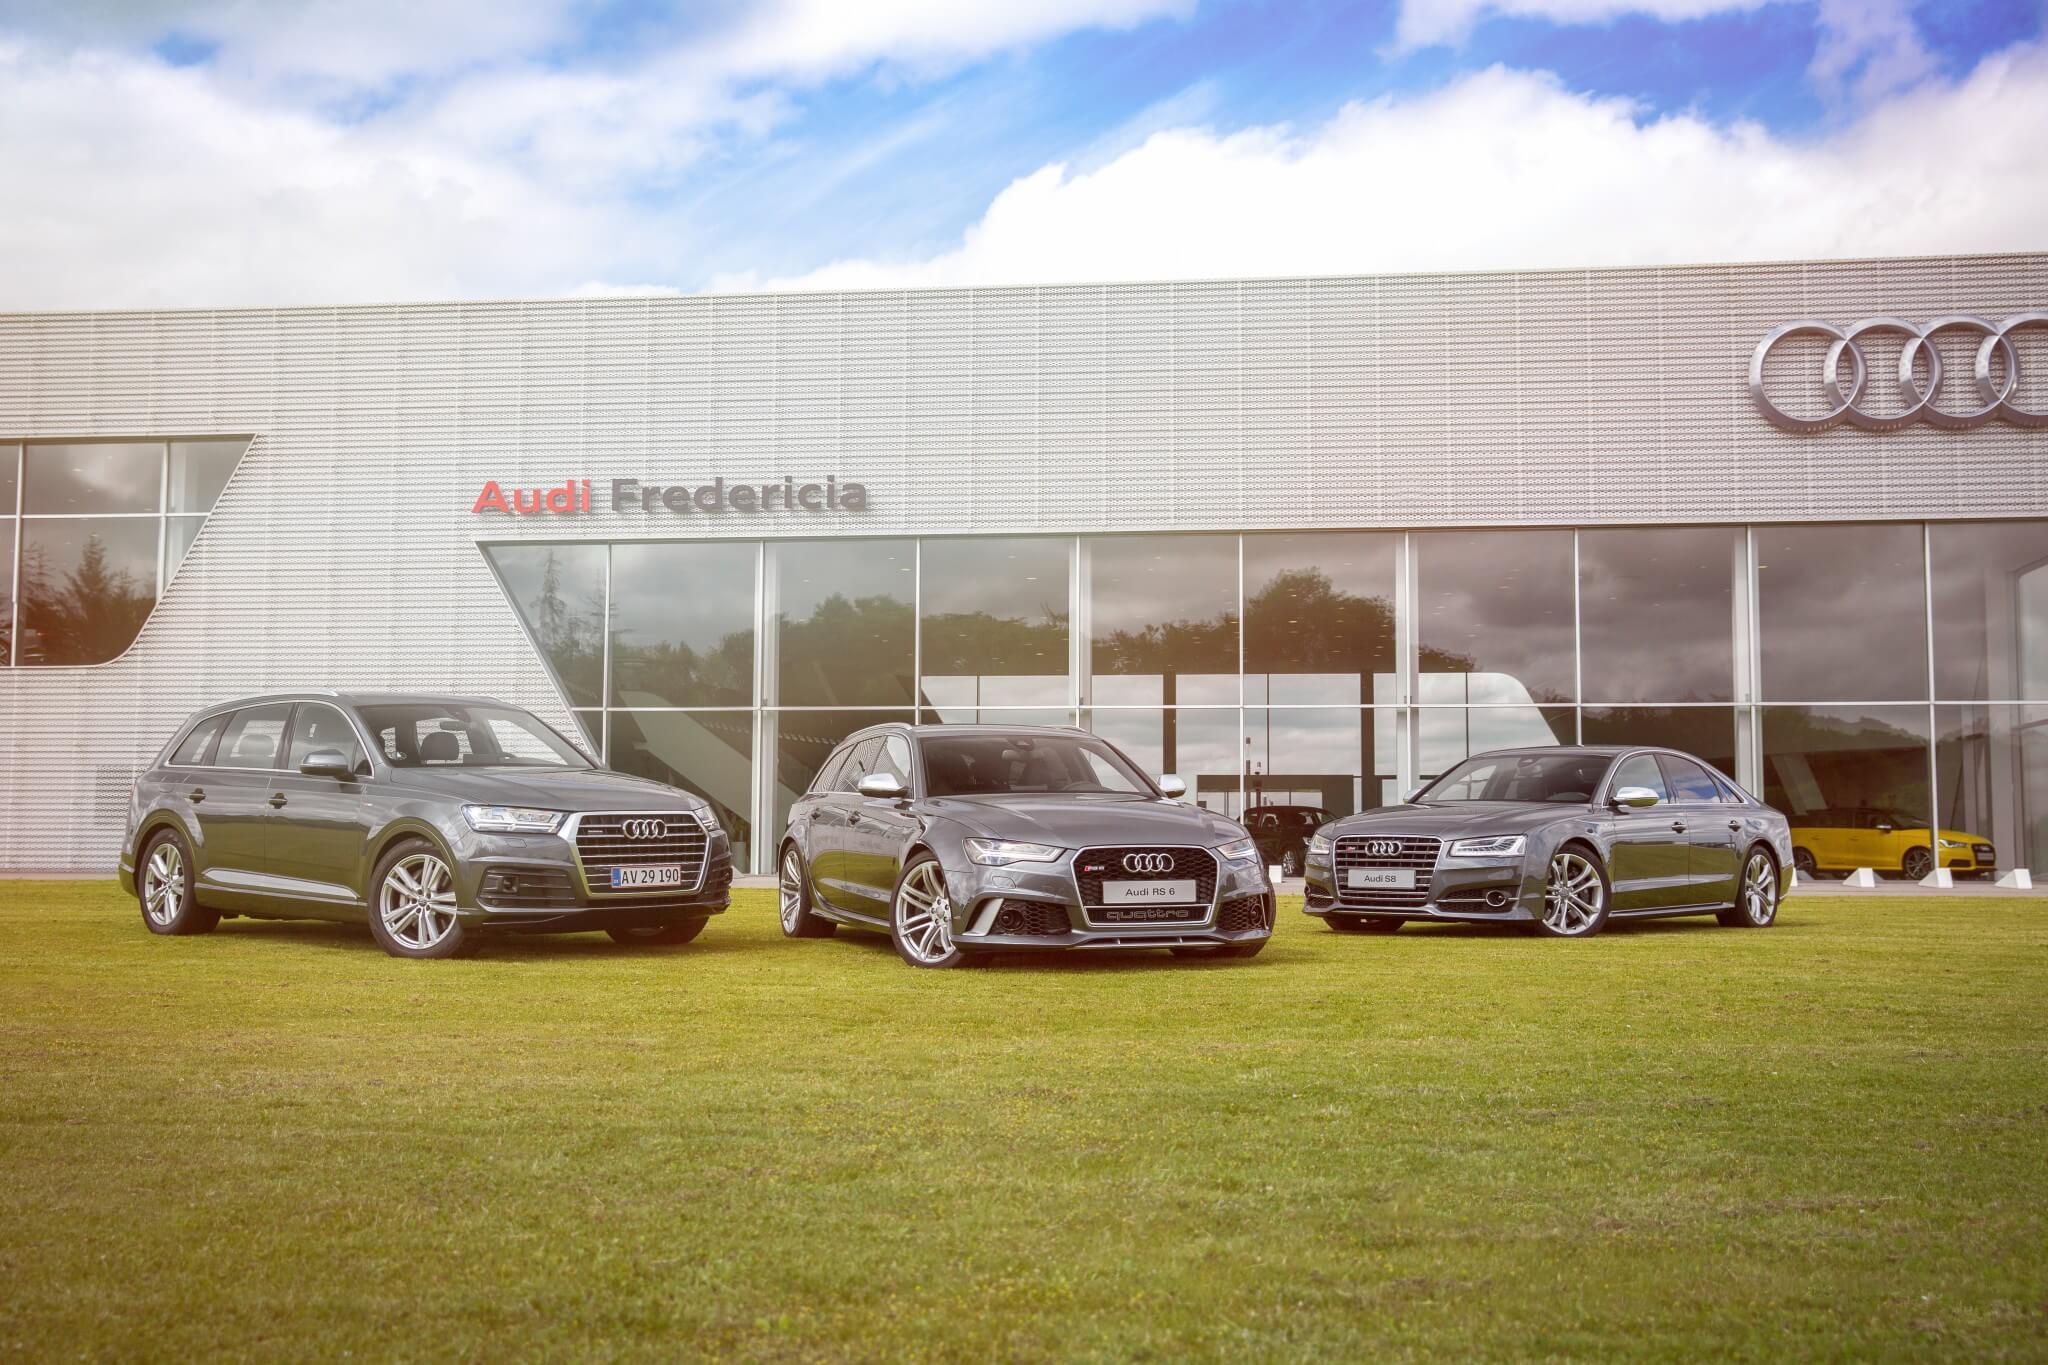 Audi Fredericia Denmark